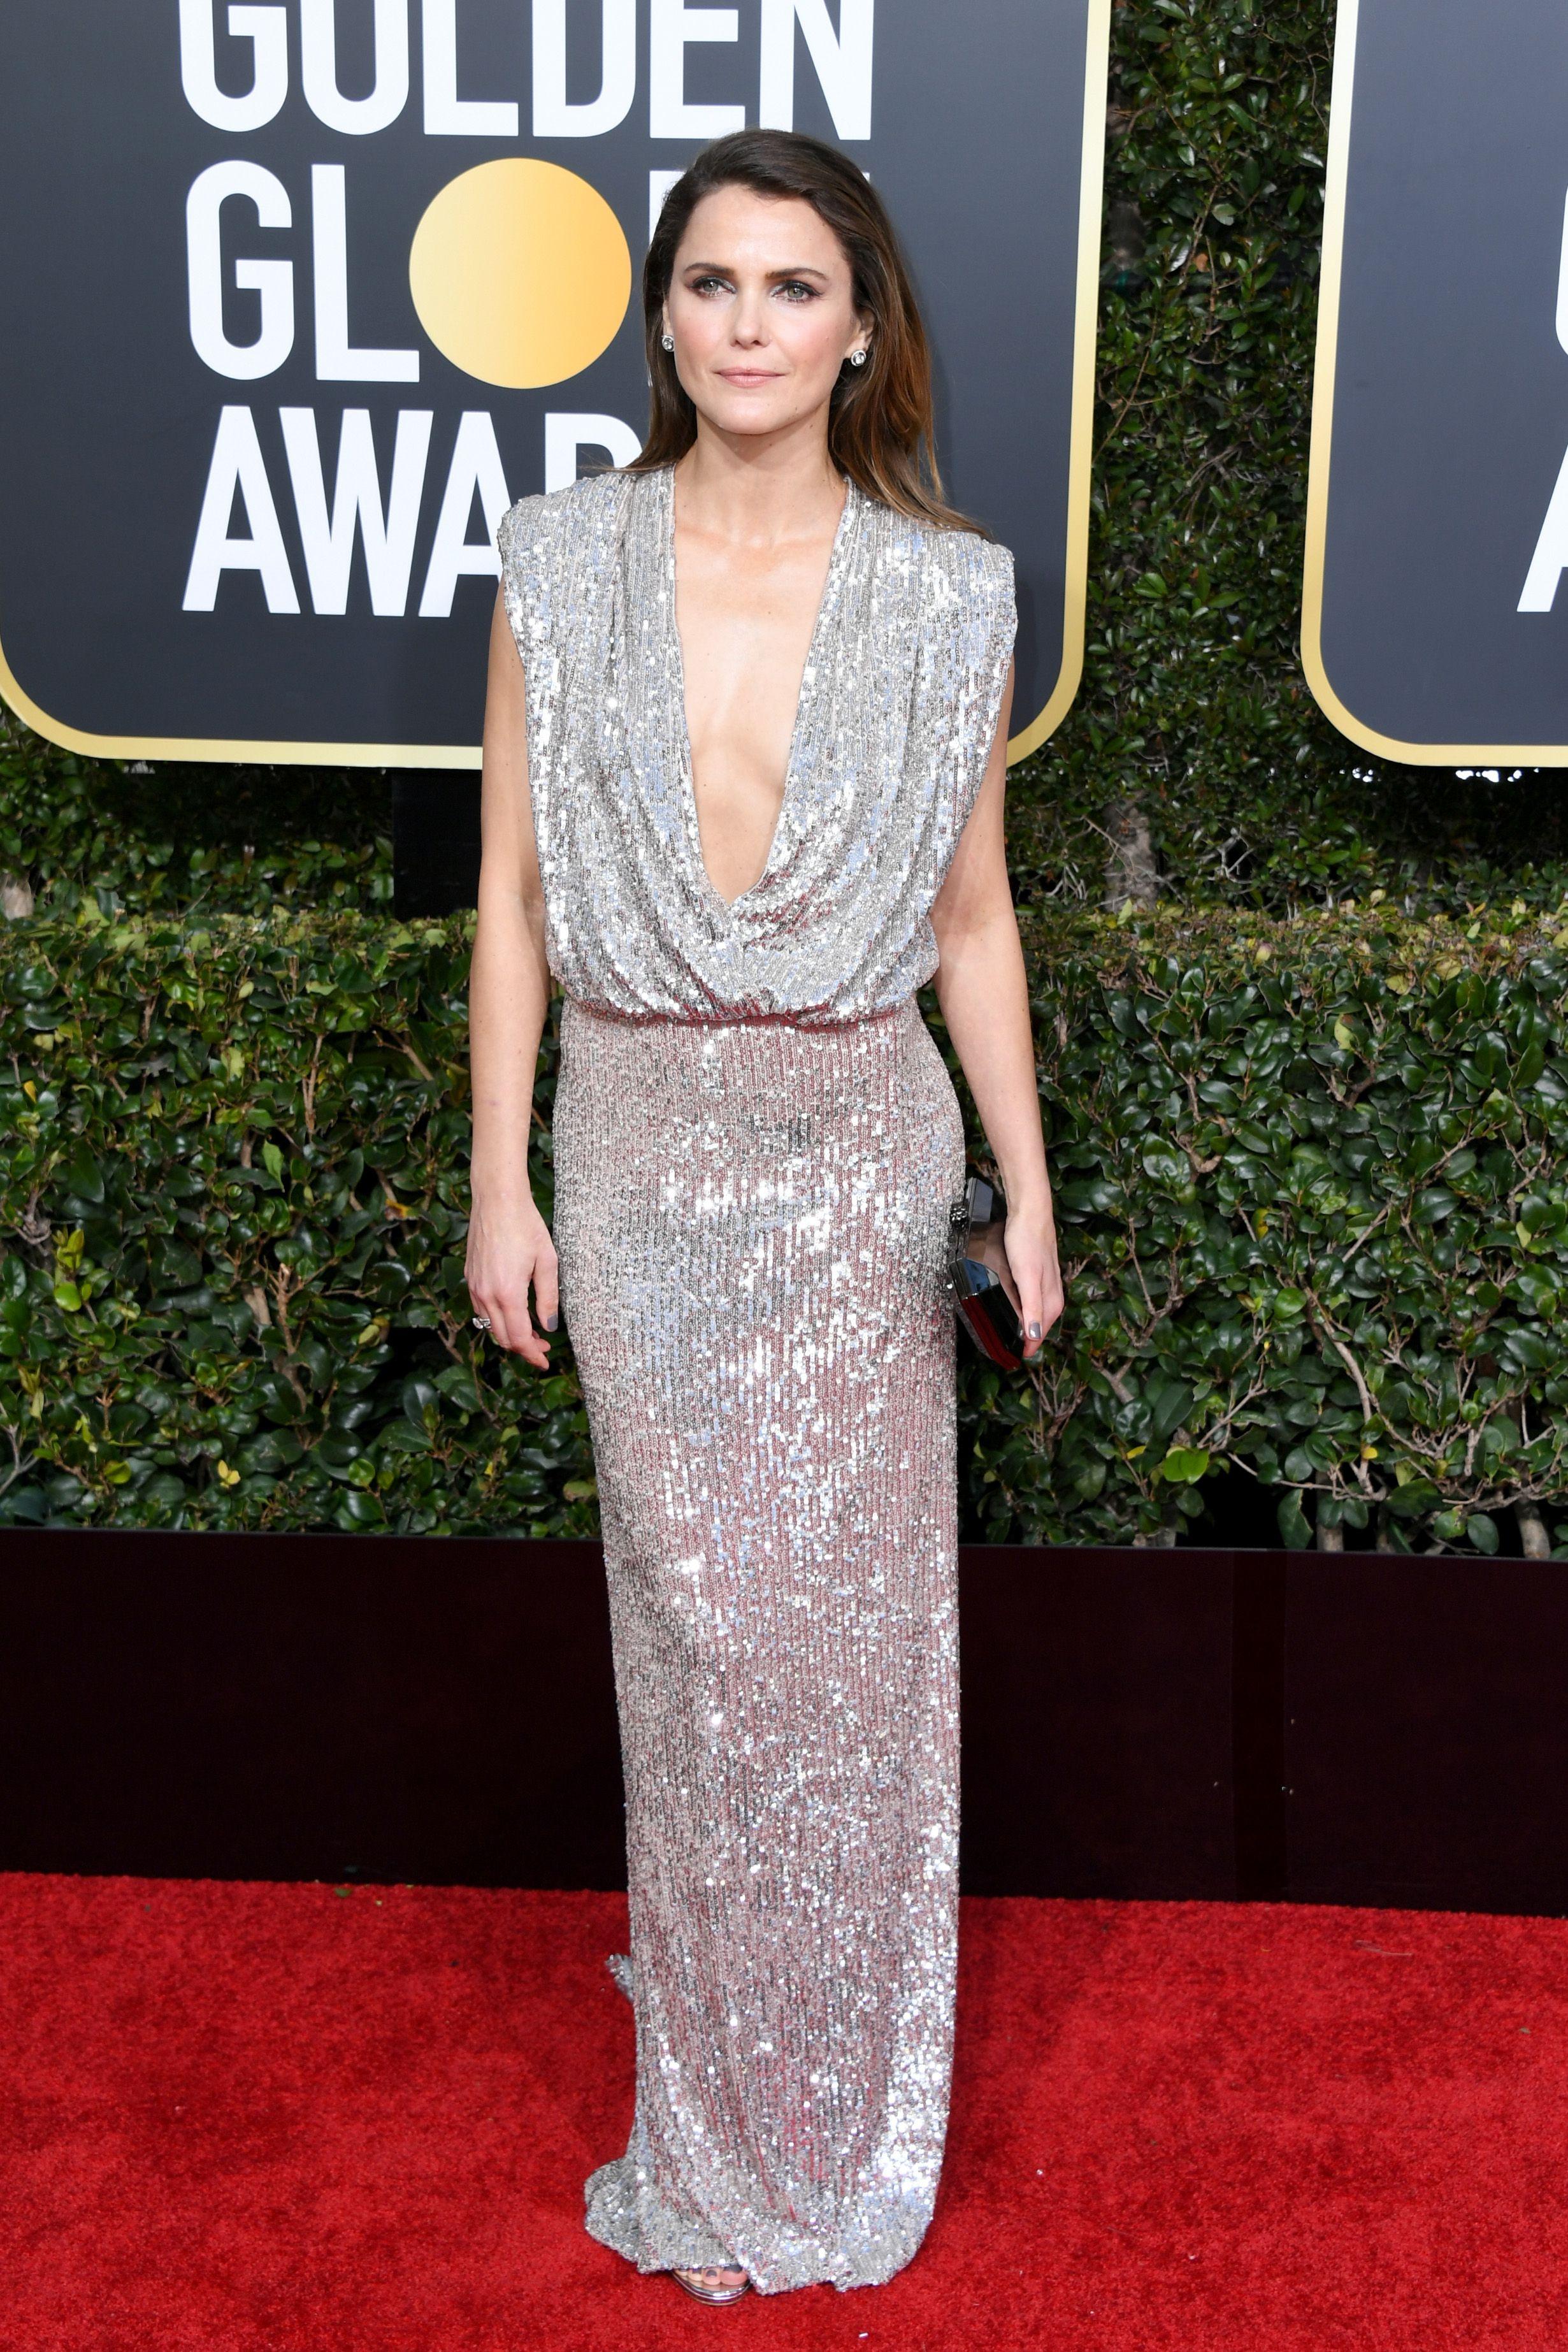 a4c249b45b Keri Russell Wore a Metallic Plunging Neckline Dress to the 2019 Golden  Globes